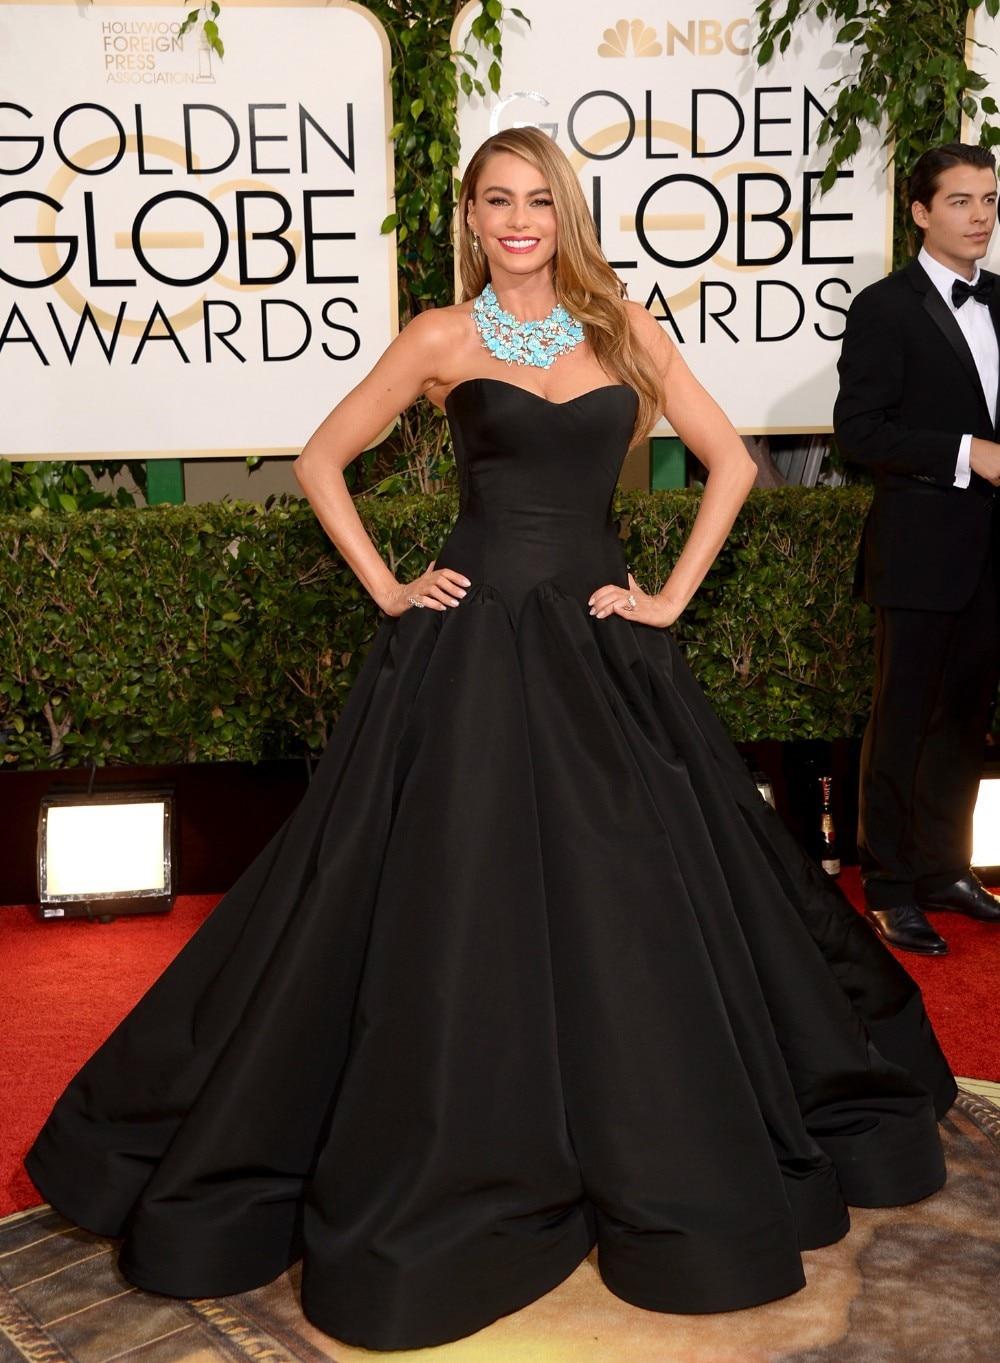 2015 Fashion Black Ball Gown Sofia Vergara Dresses Strapless